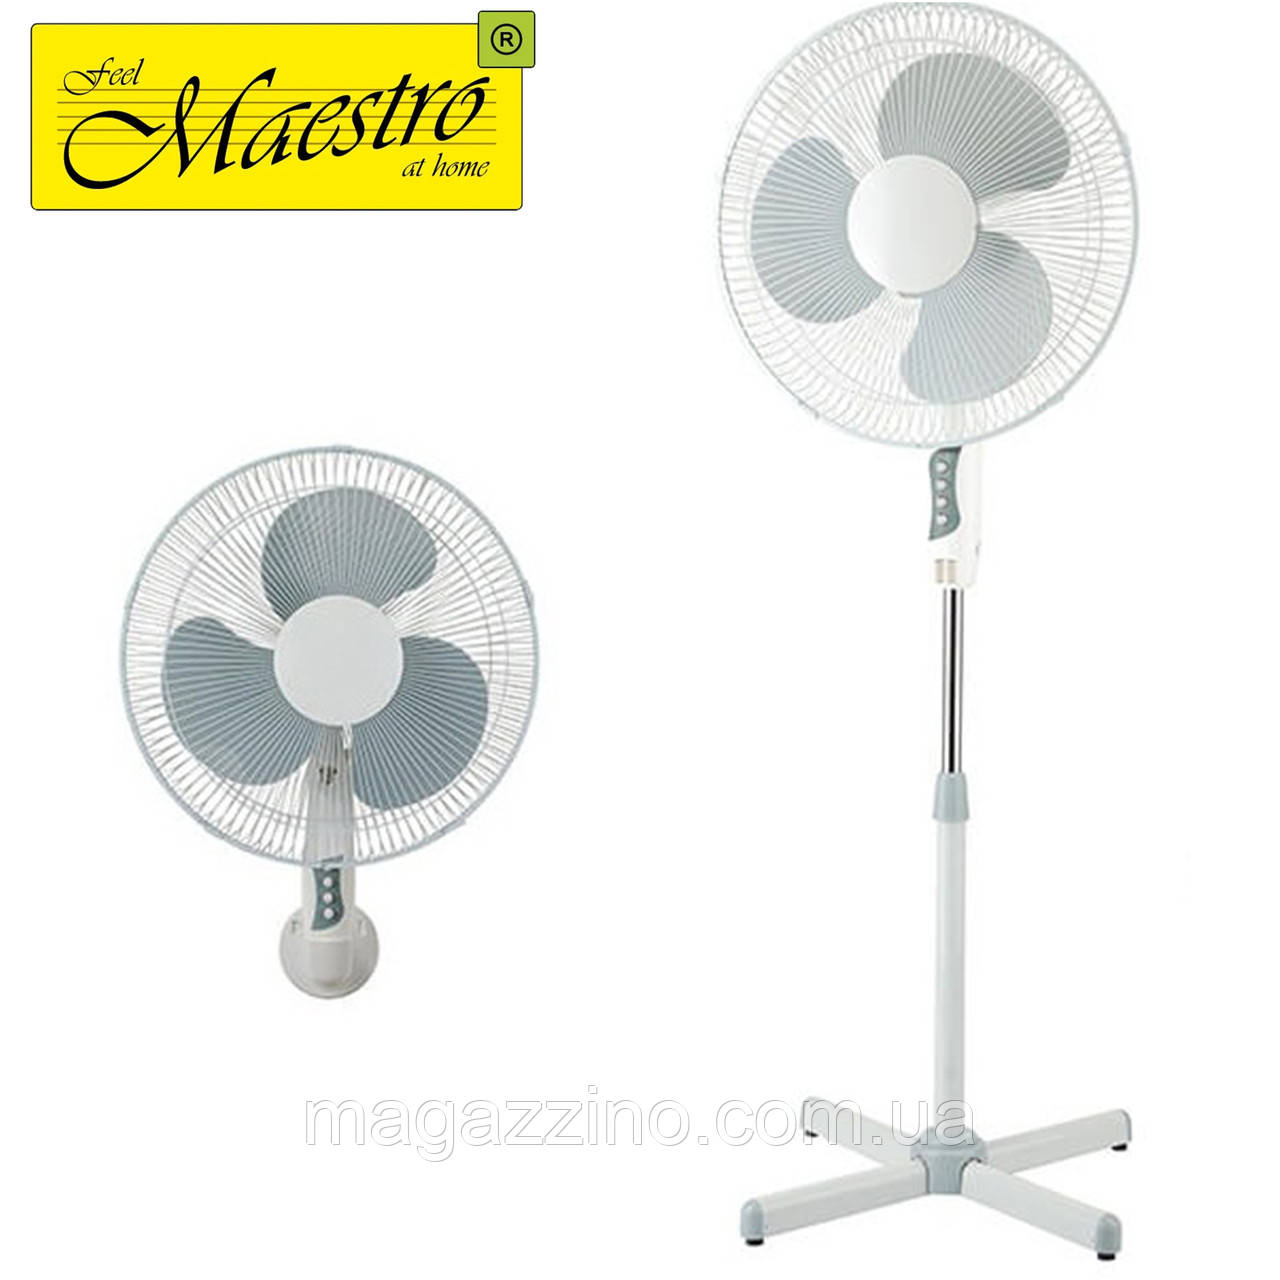 Вентилятор 2в1 Maestro MR-902, 60 Вт.